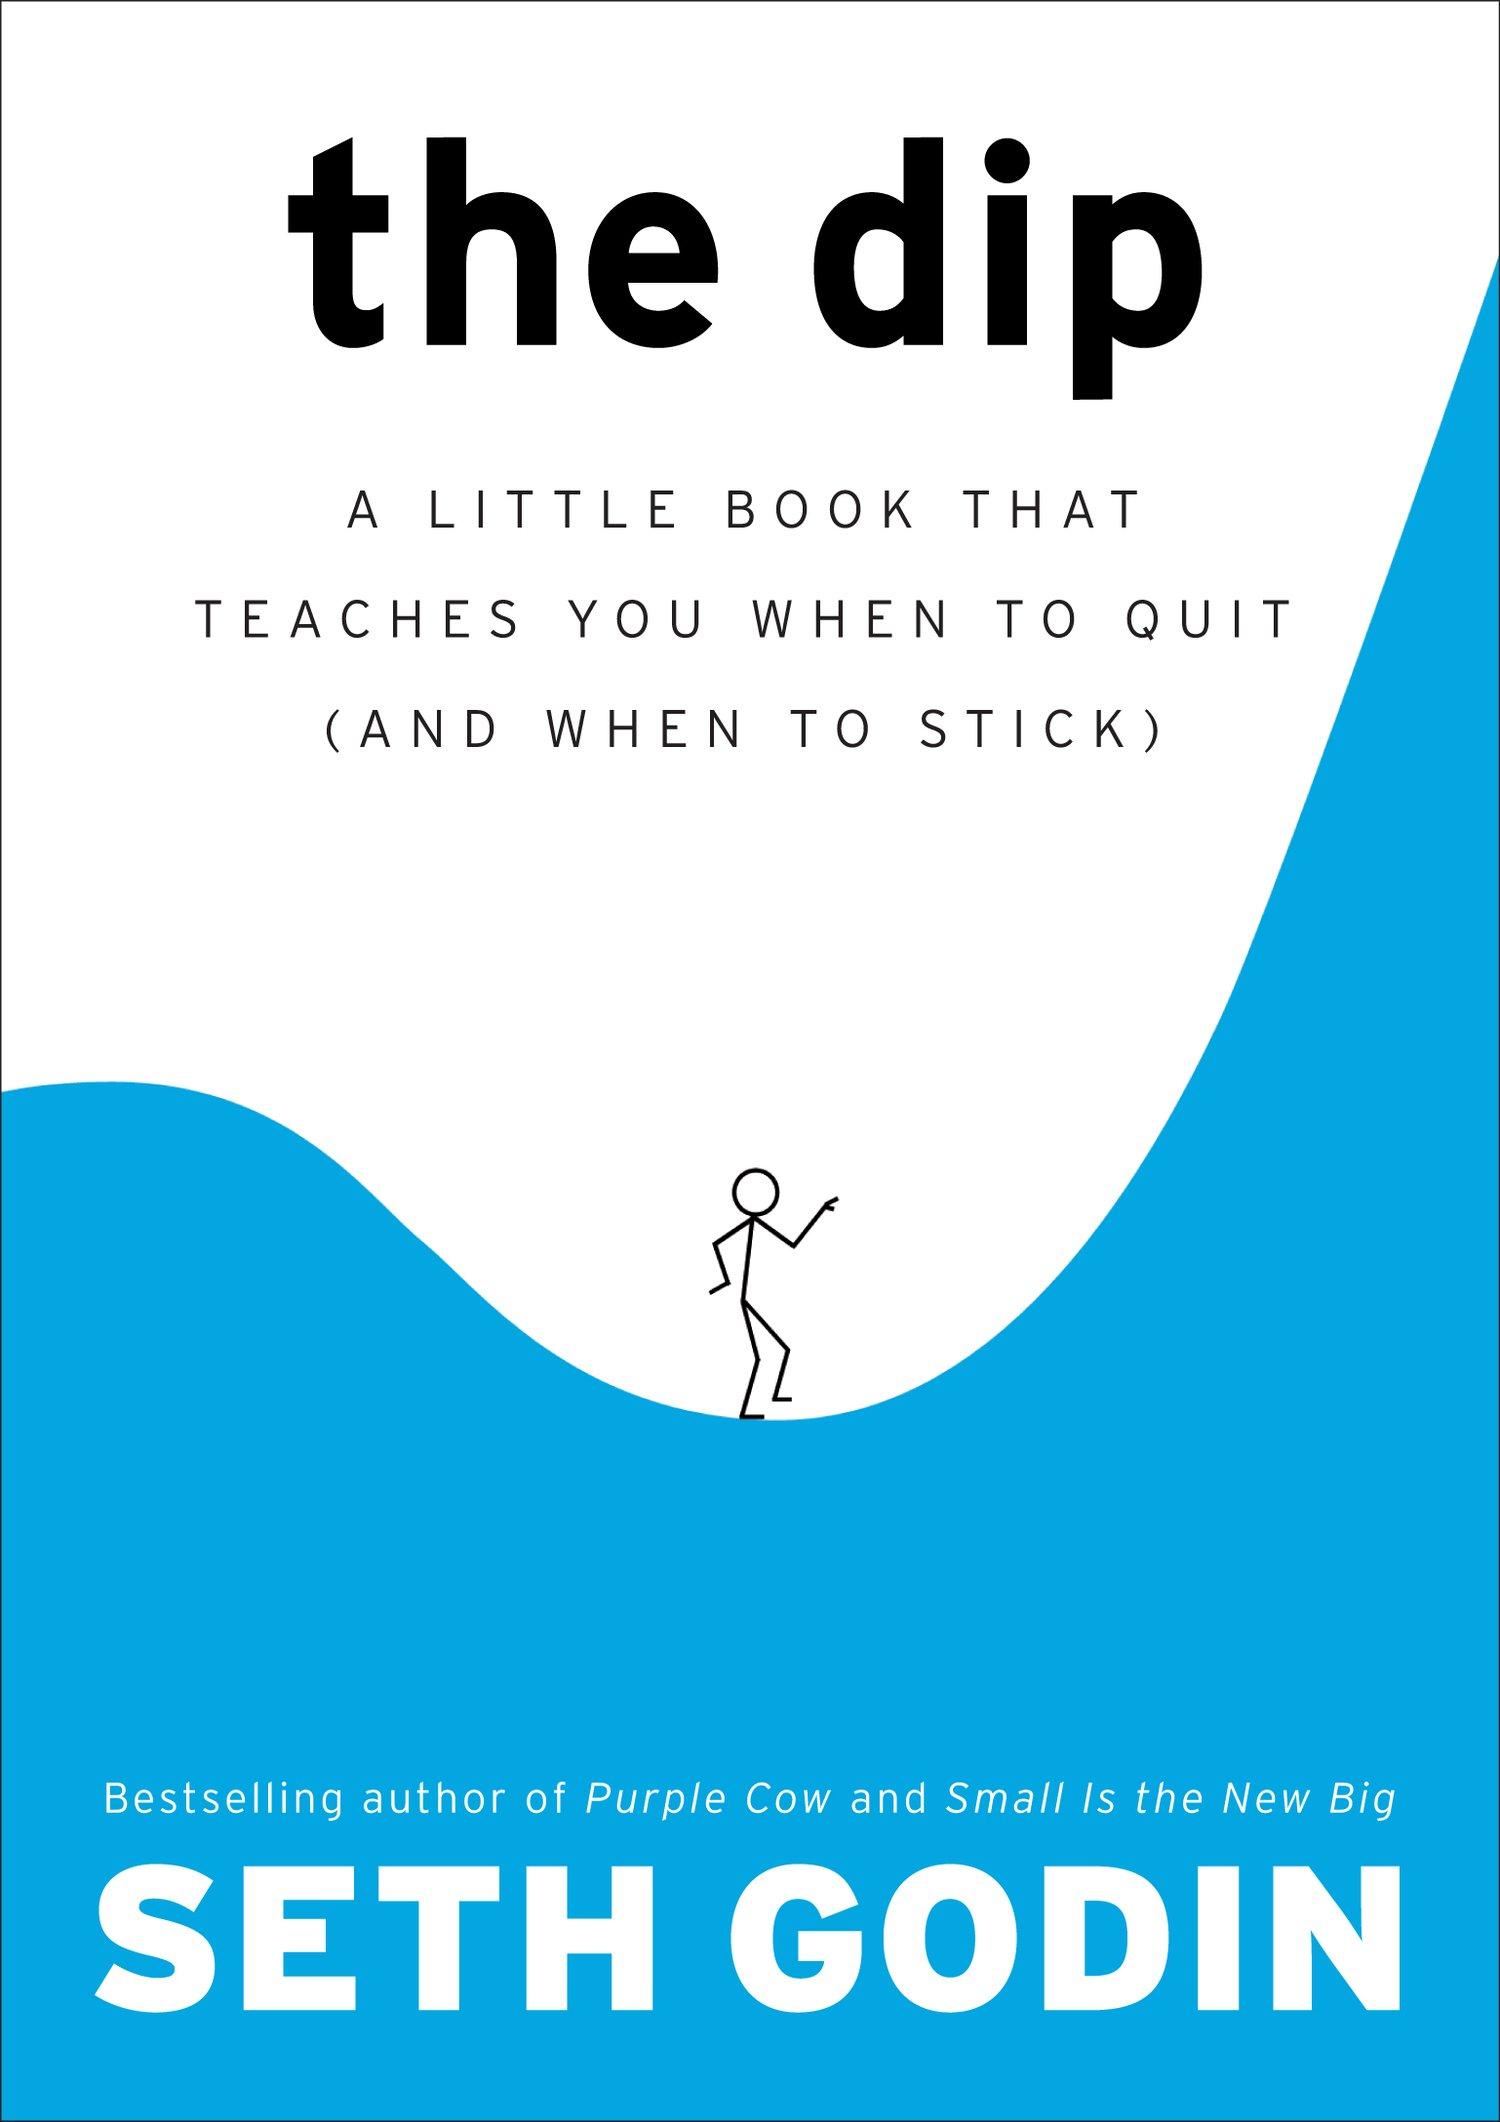 Seth Godin - The Dip